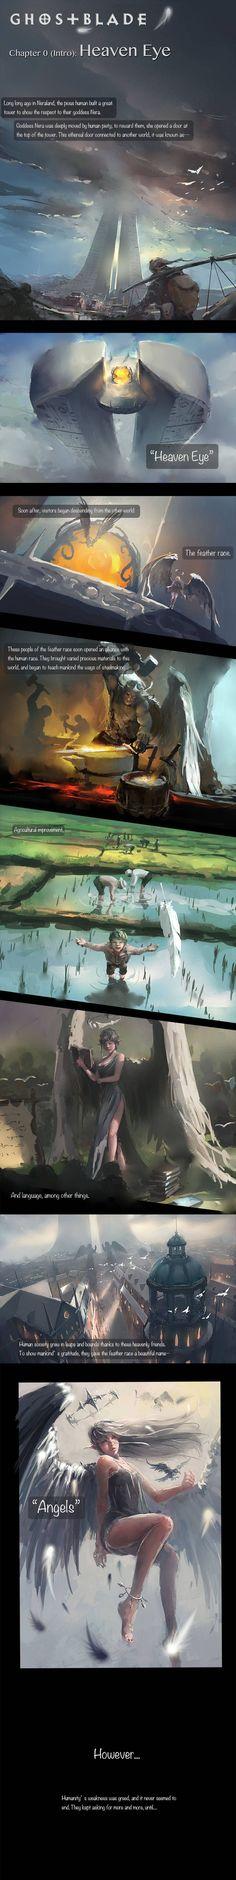 GhostBlade :: Chapter 0 (Intro): Heaven Eye | Tapastic Comics - image 1